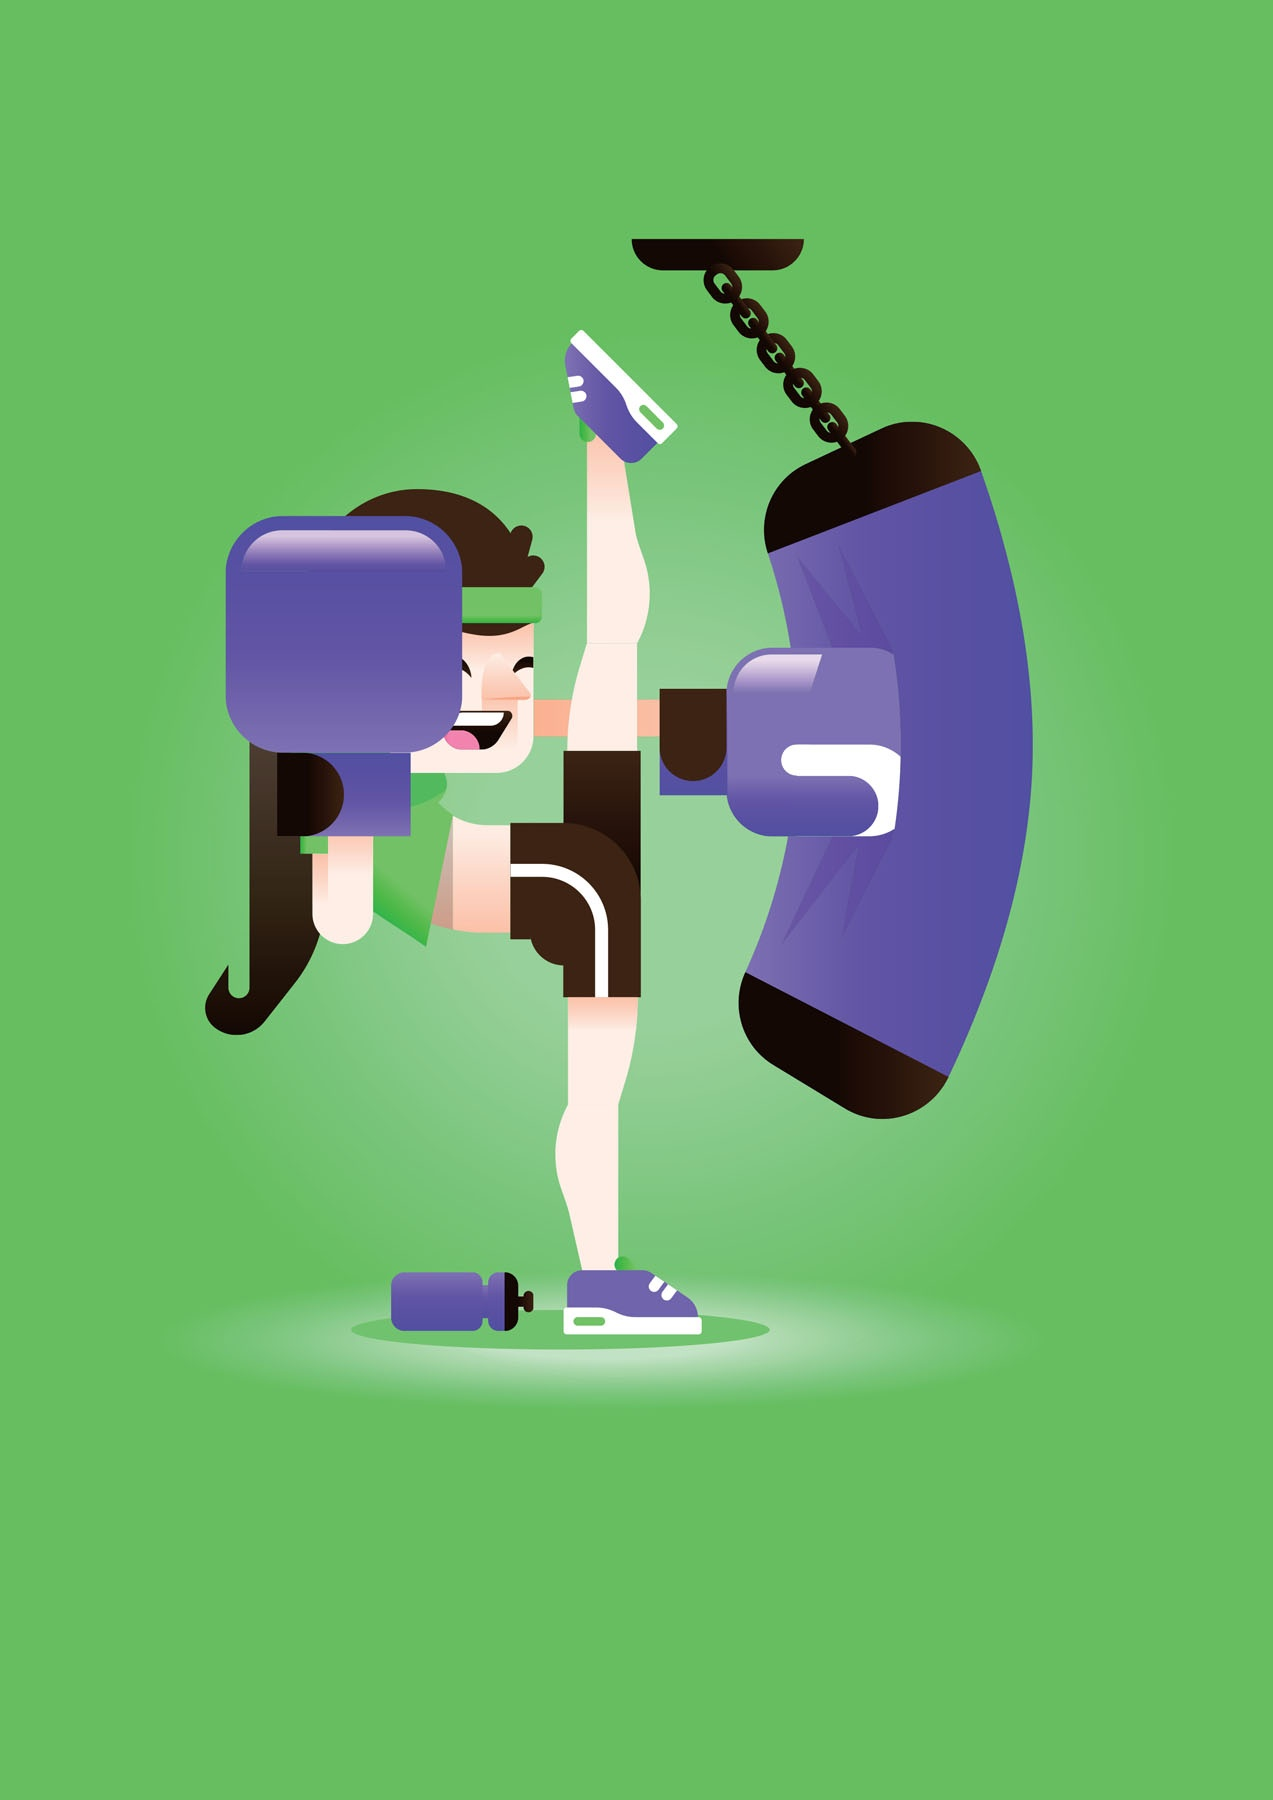 Illustration of woman kickboxing.